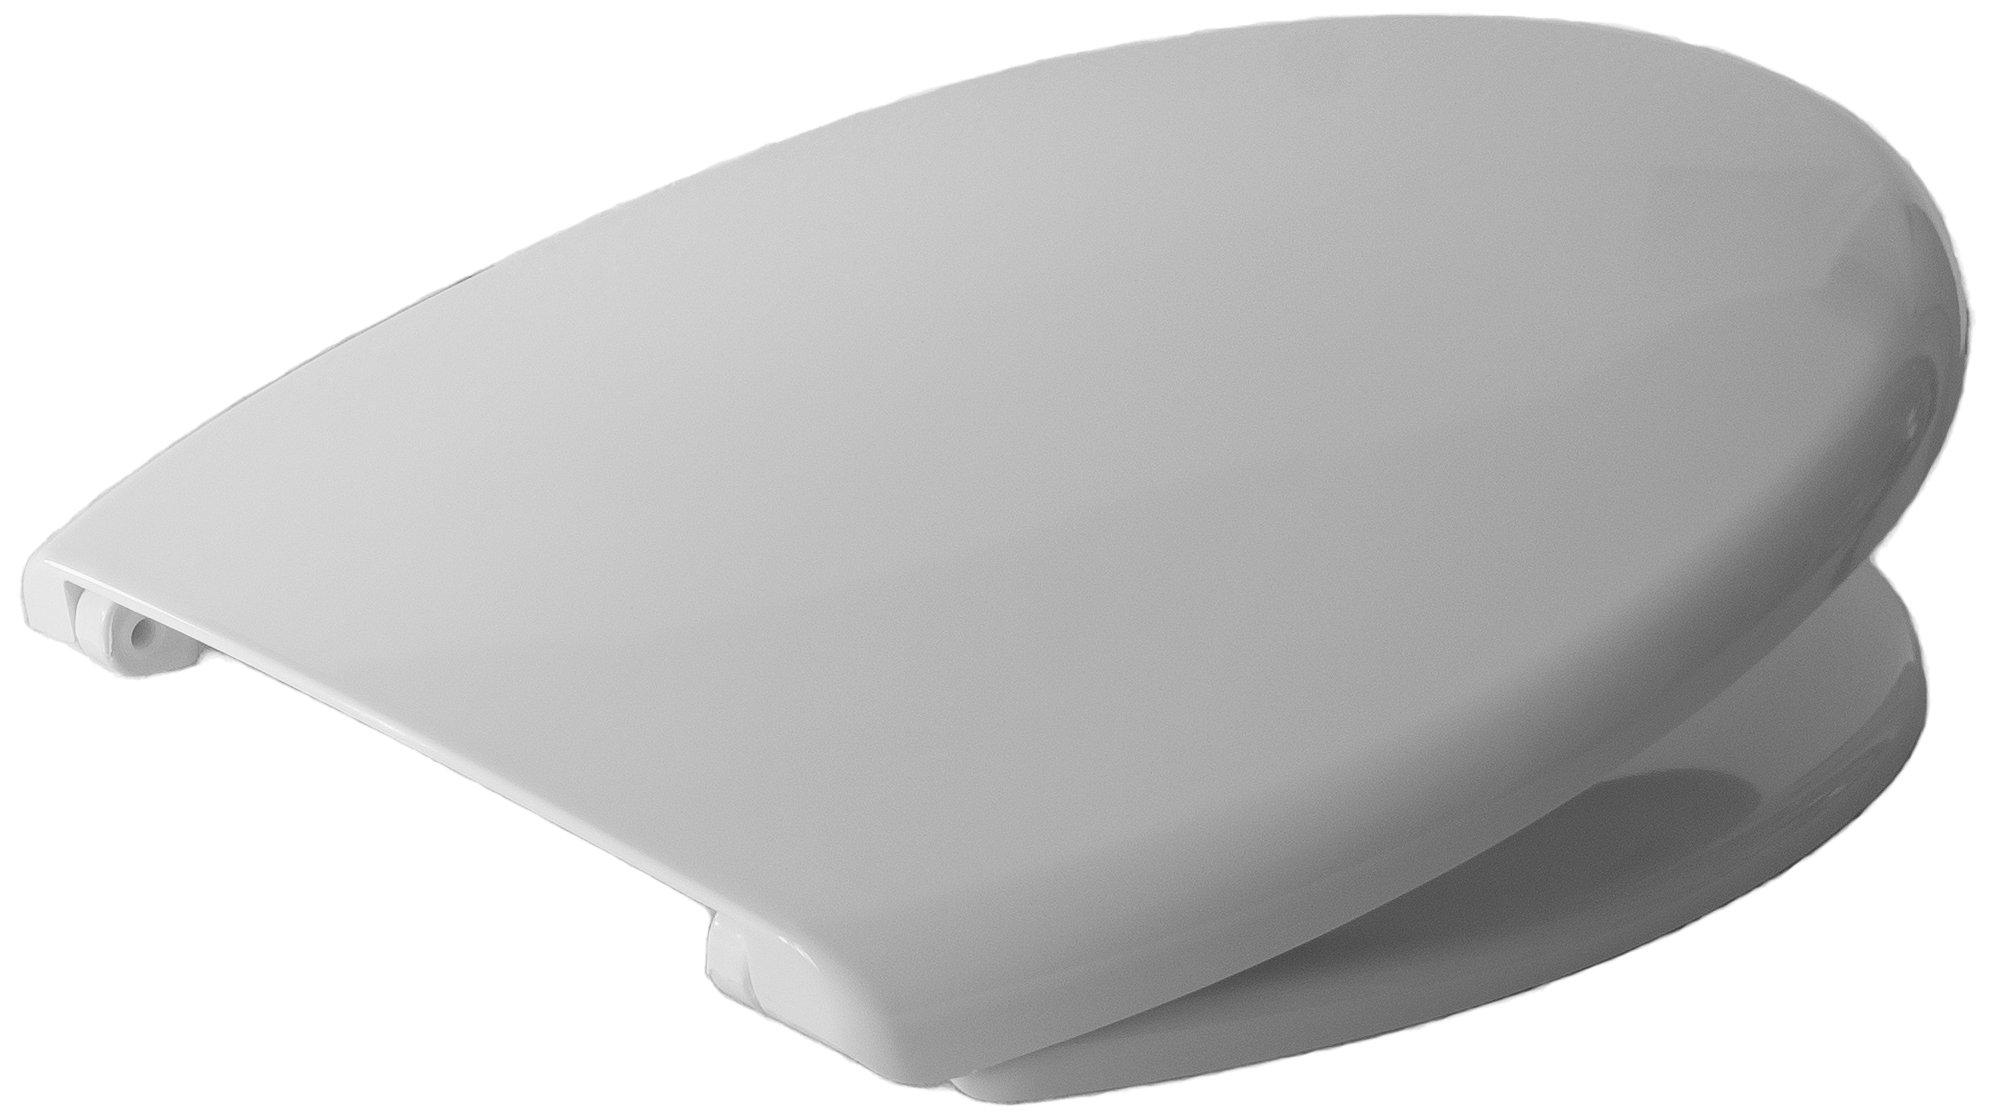 eurocornici Sinks selnova 3Dedicated Toilet Seat, Standard Hinge